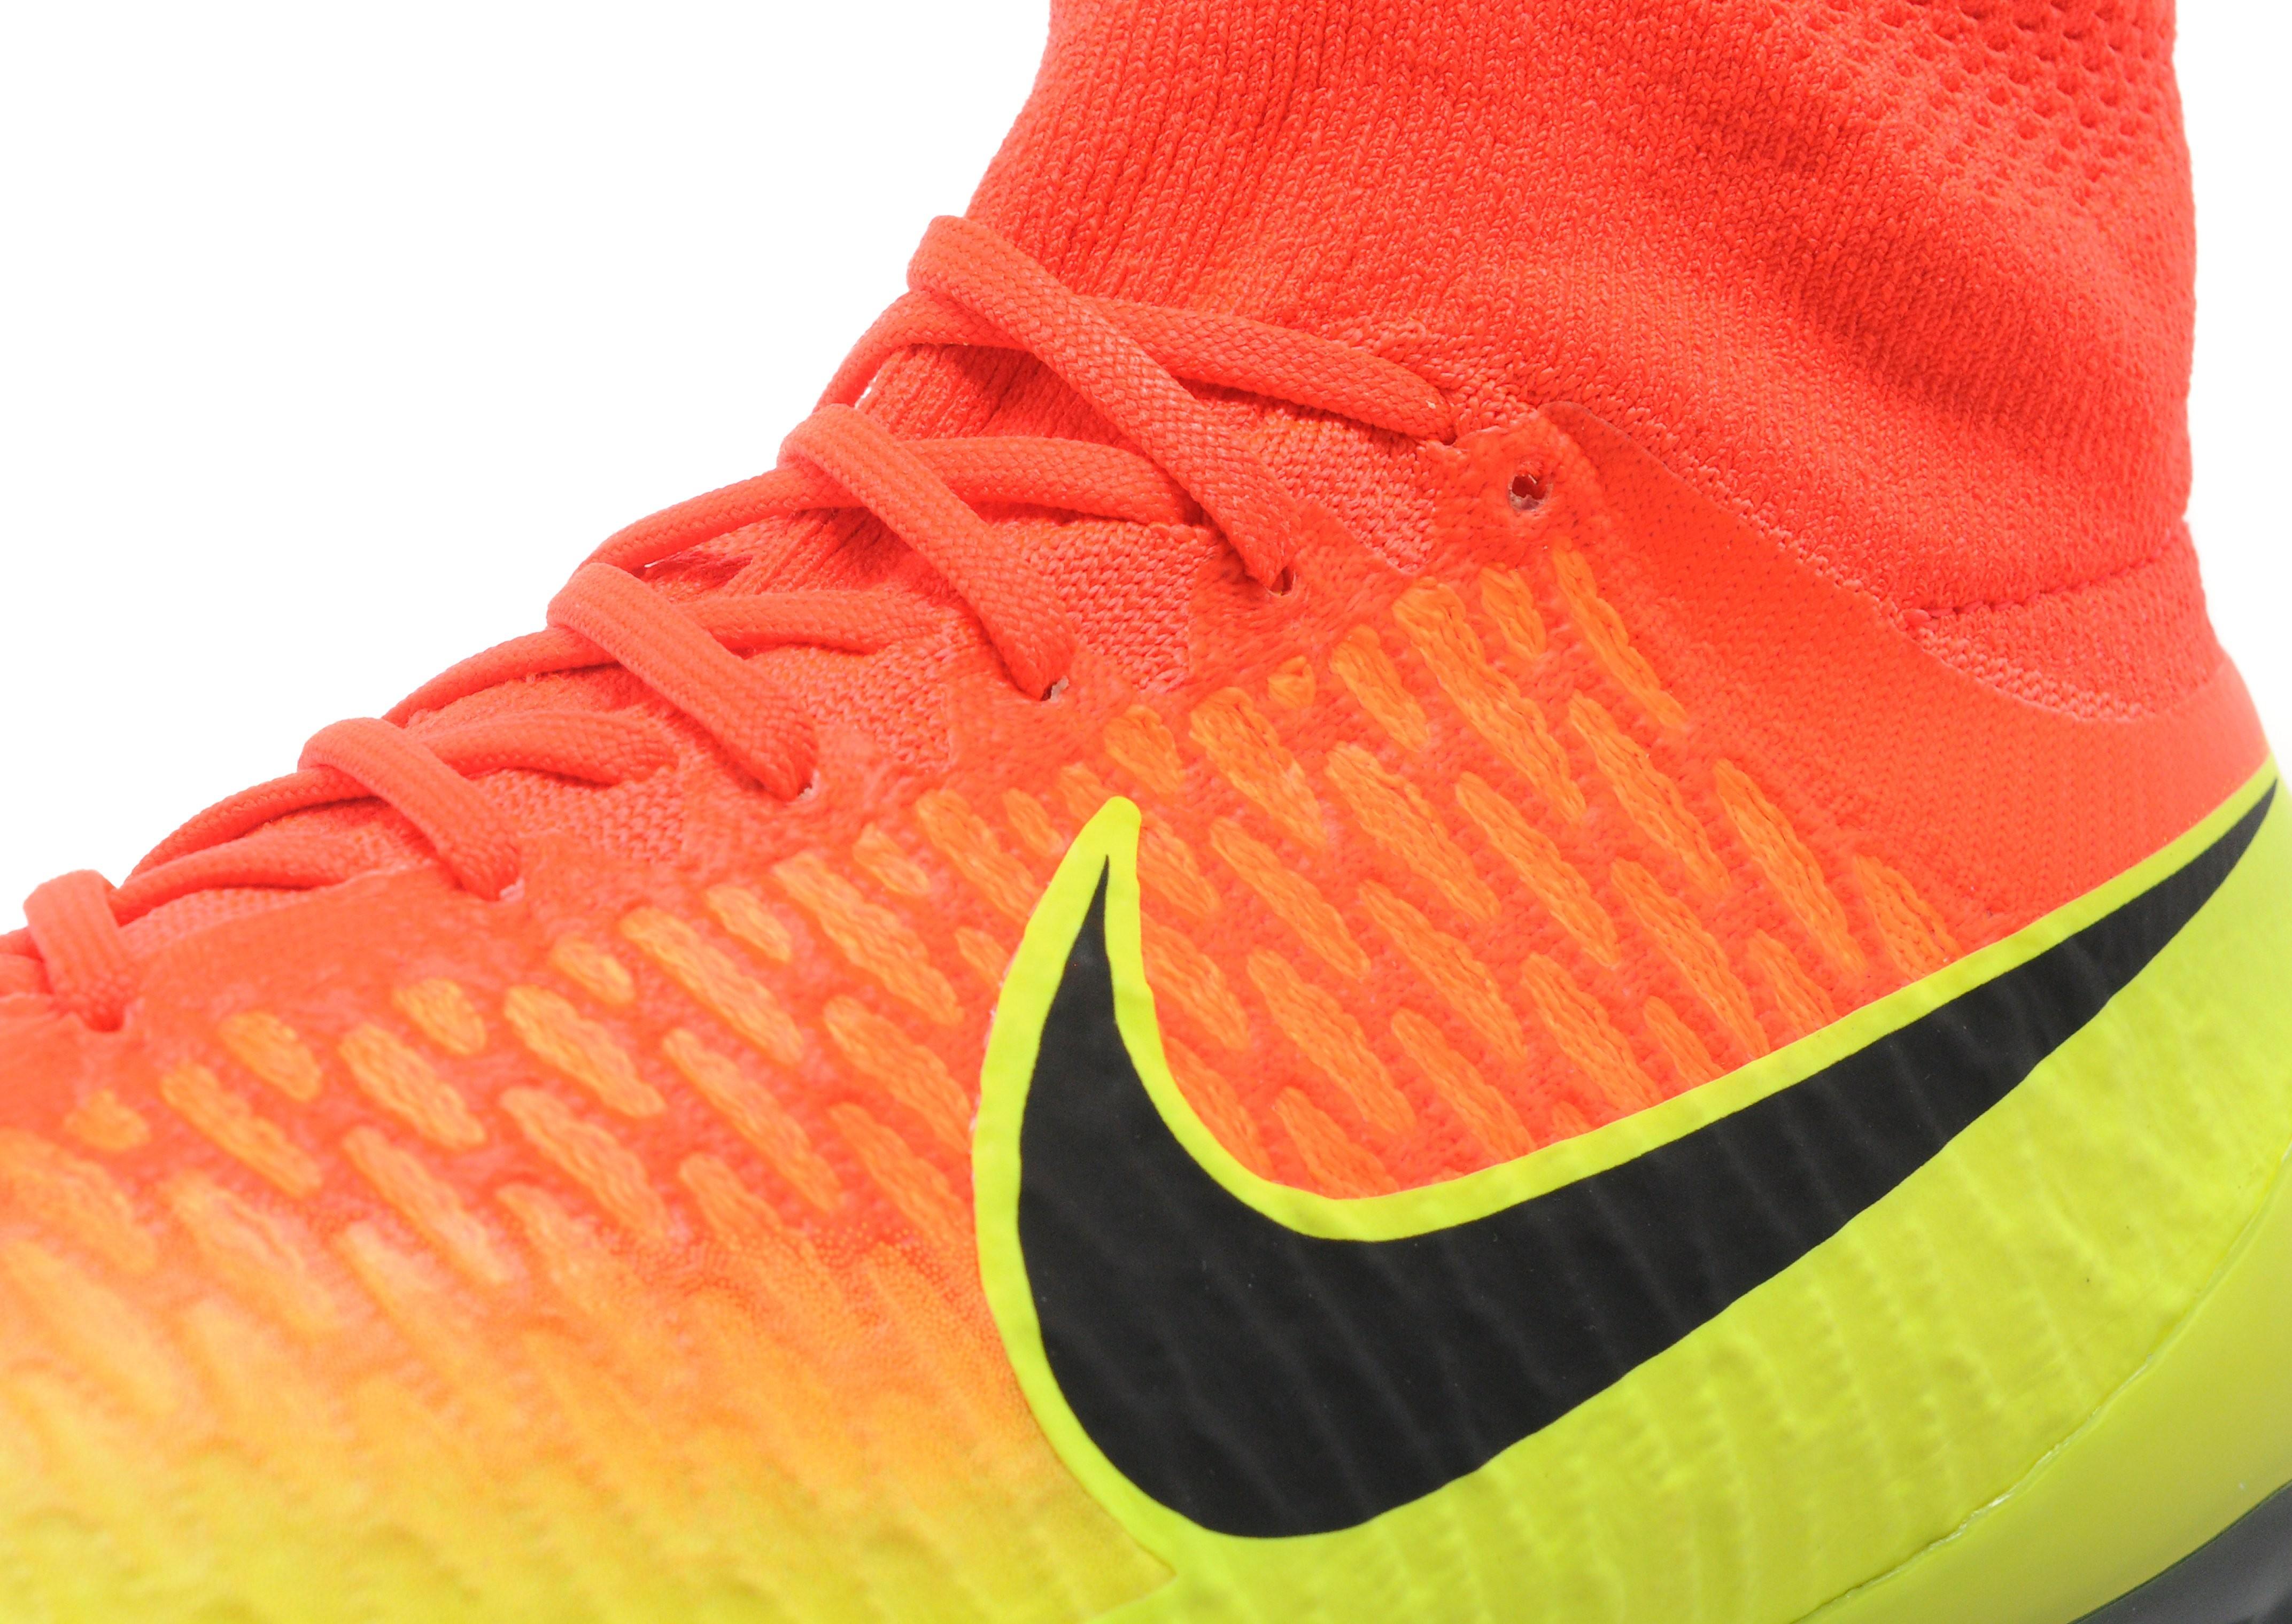 Nike Spark Brilliance Magista Obra FG